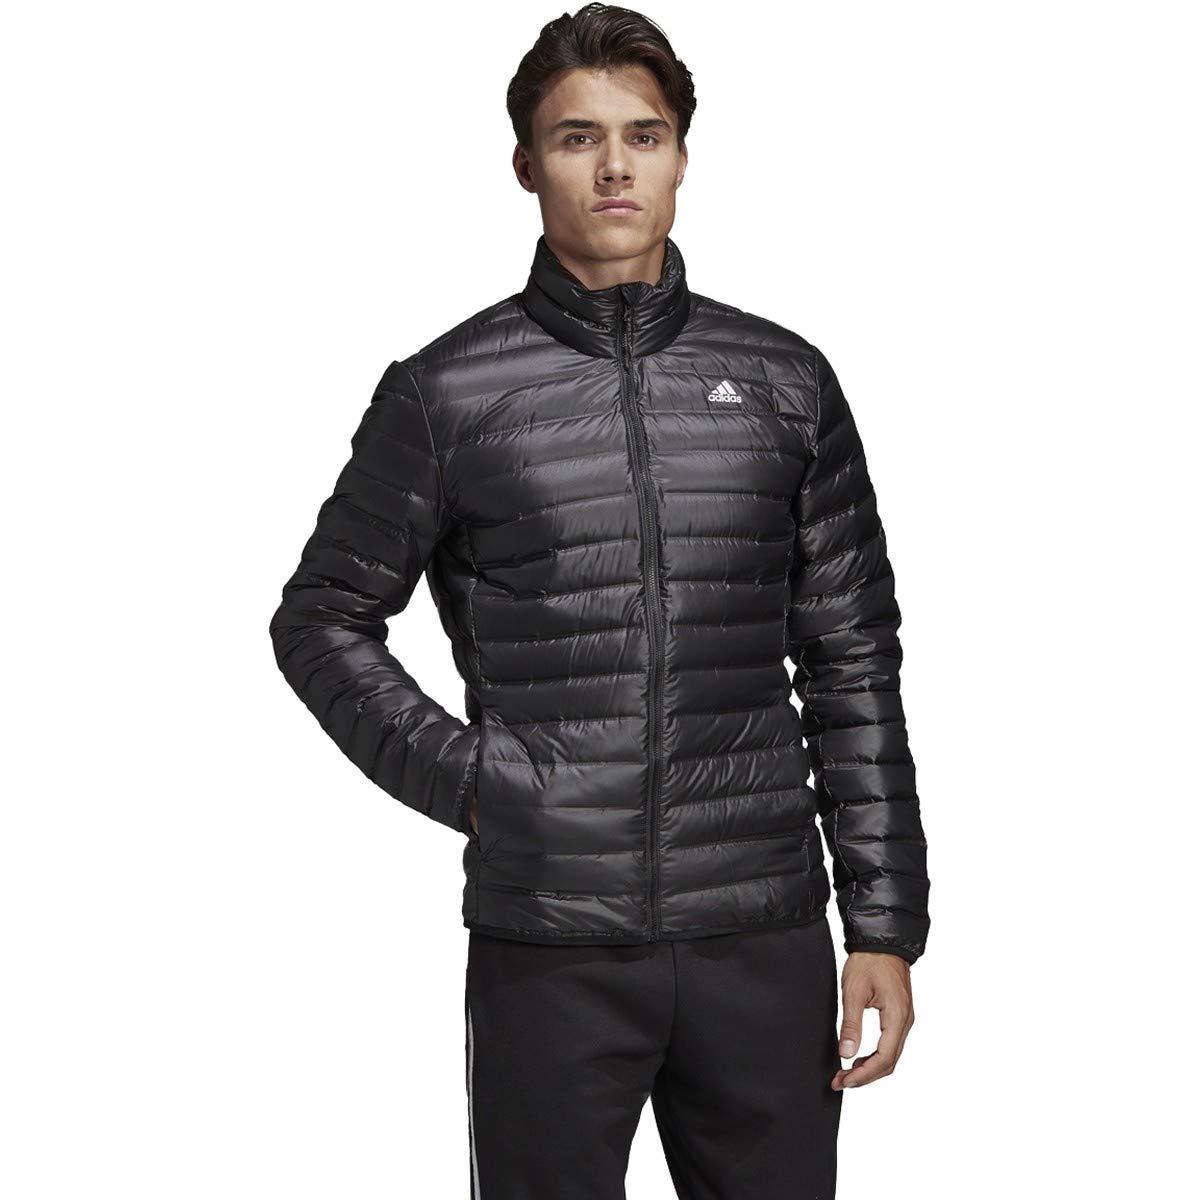 Image of Adidas Male Varilite Down Jacket Men